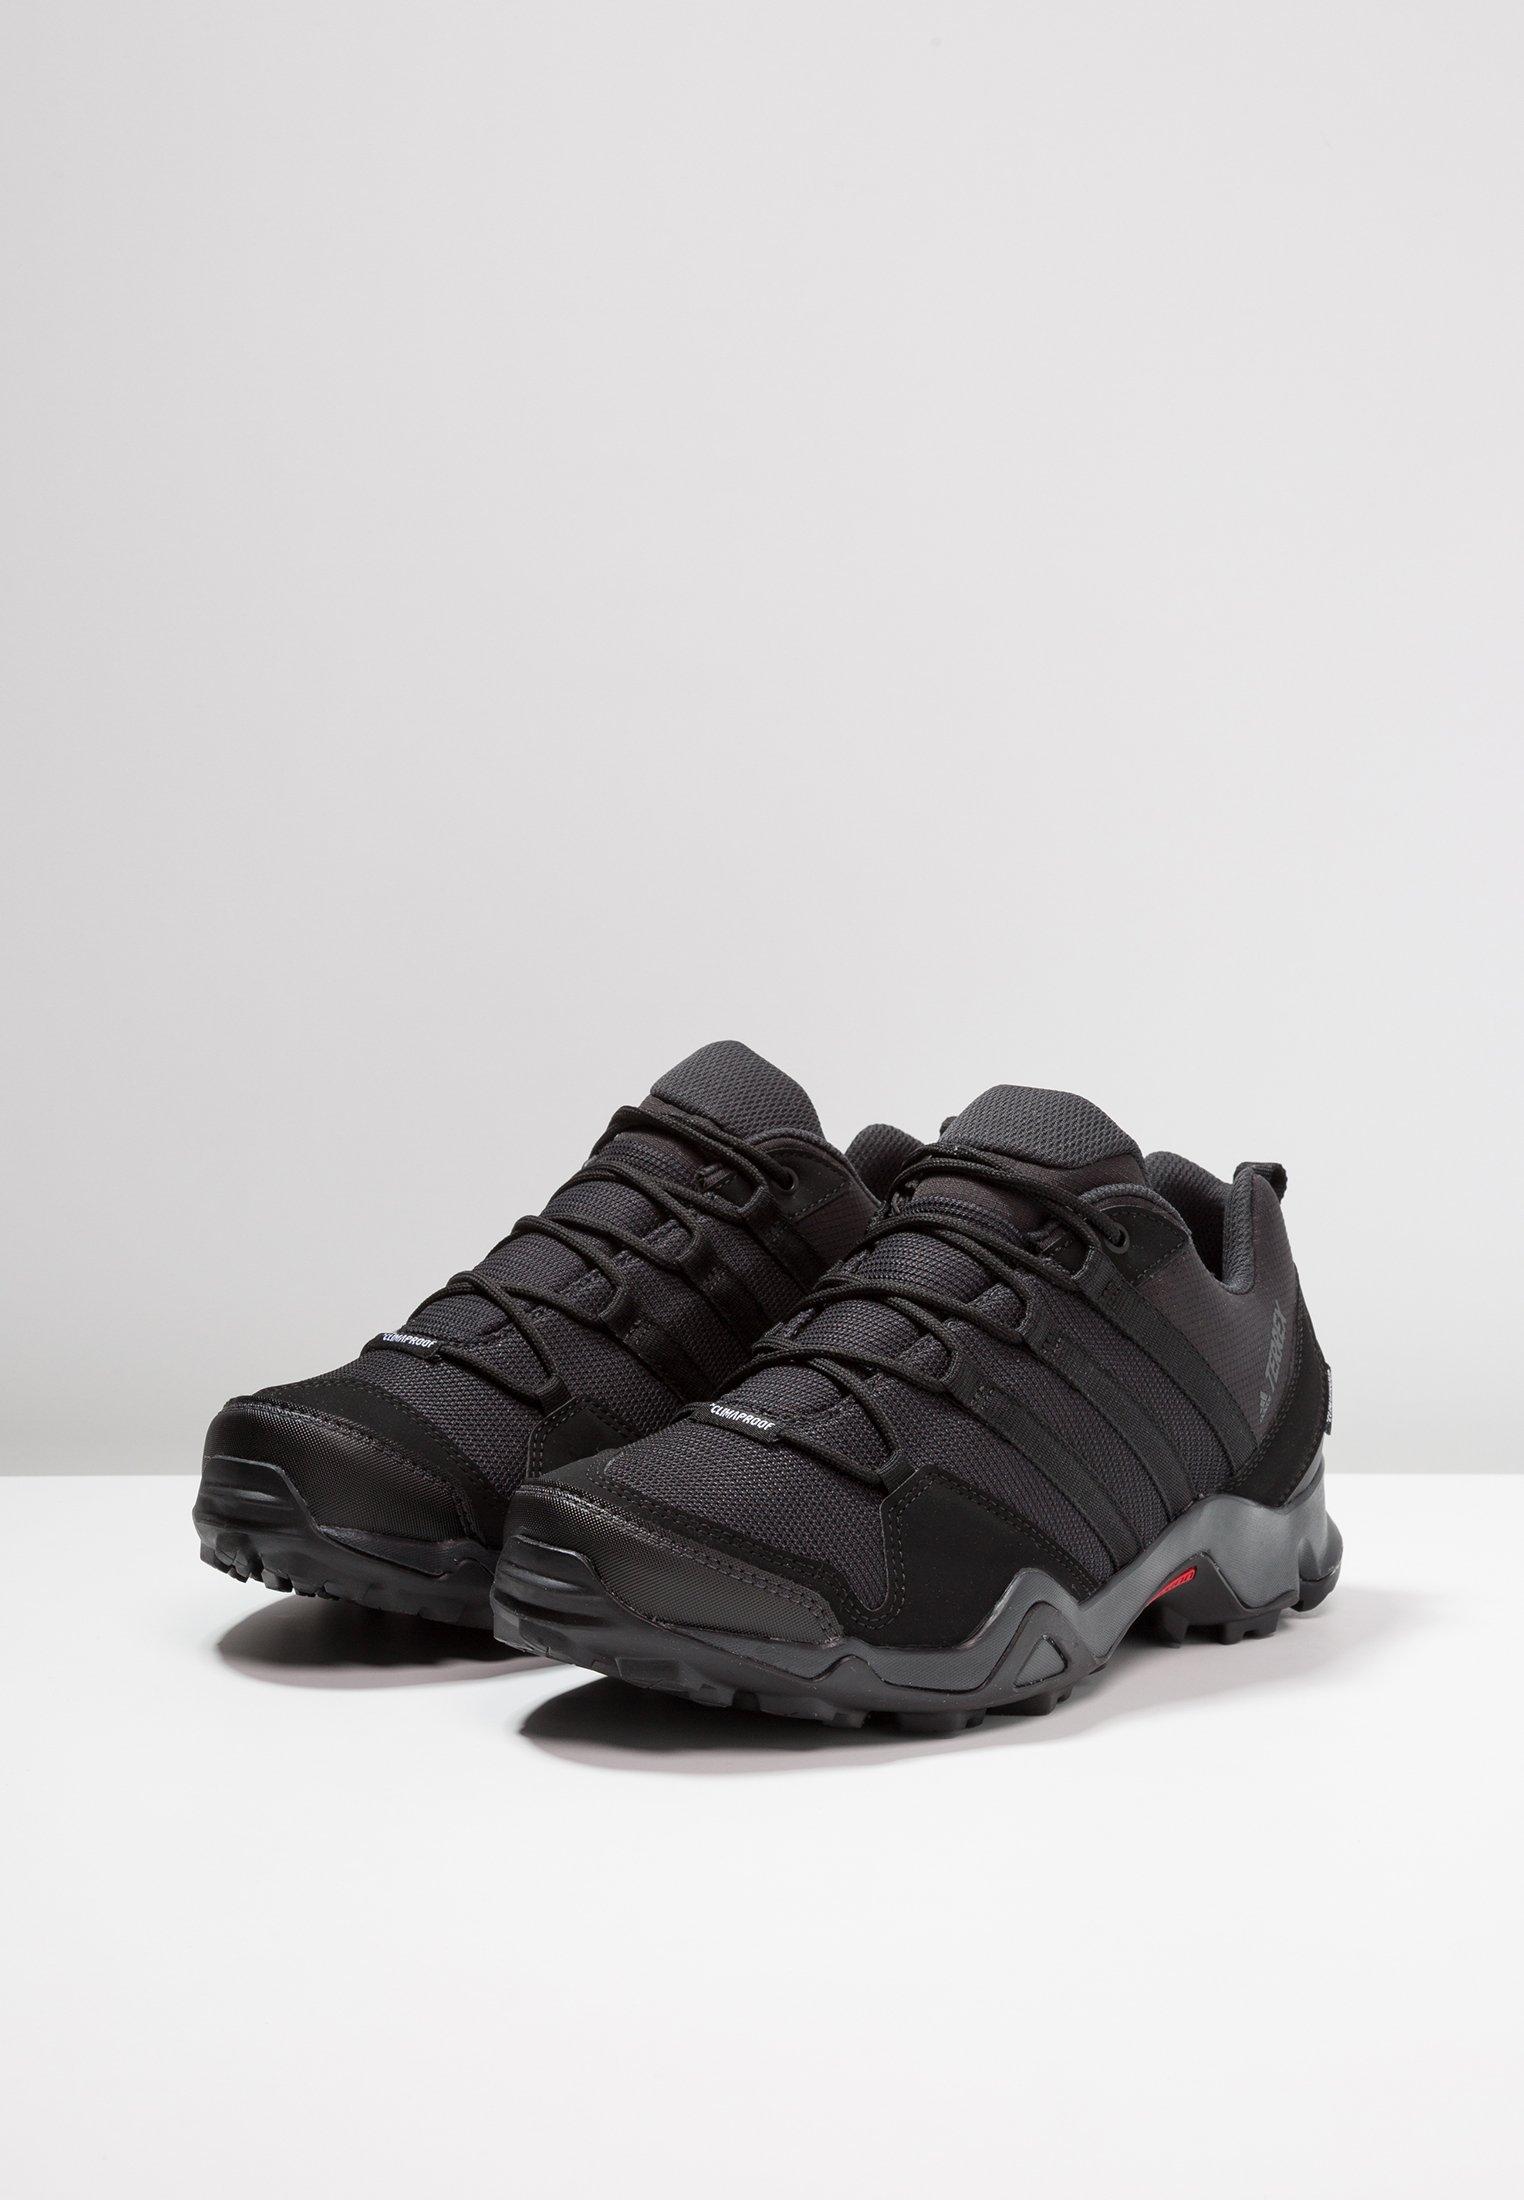 Adidas Performance Terrex Ax2 Climaproof - Hikingschuh Black Friday